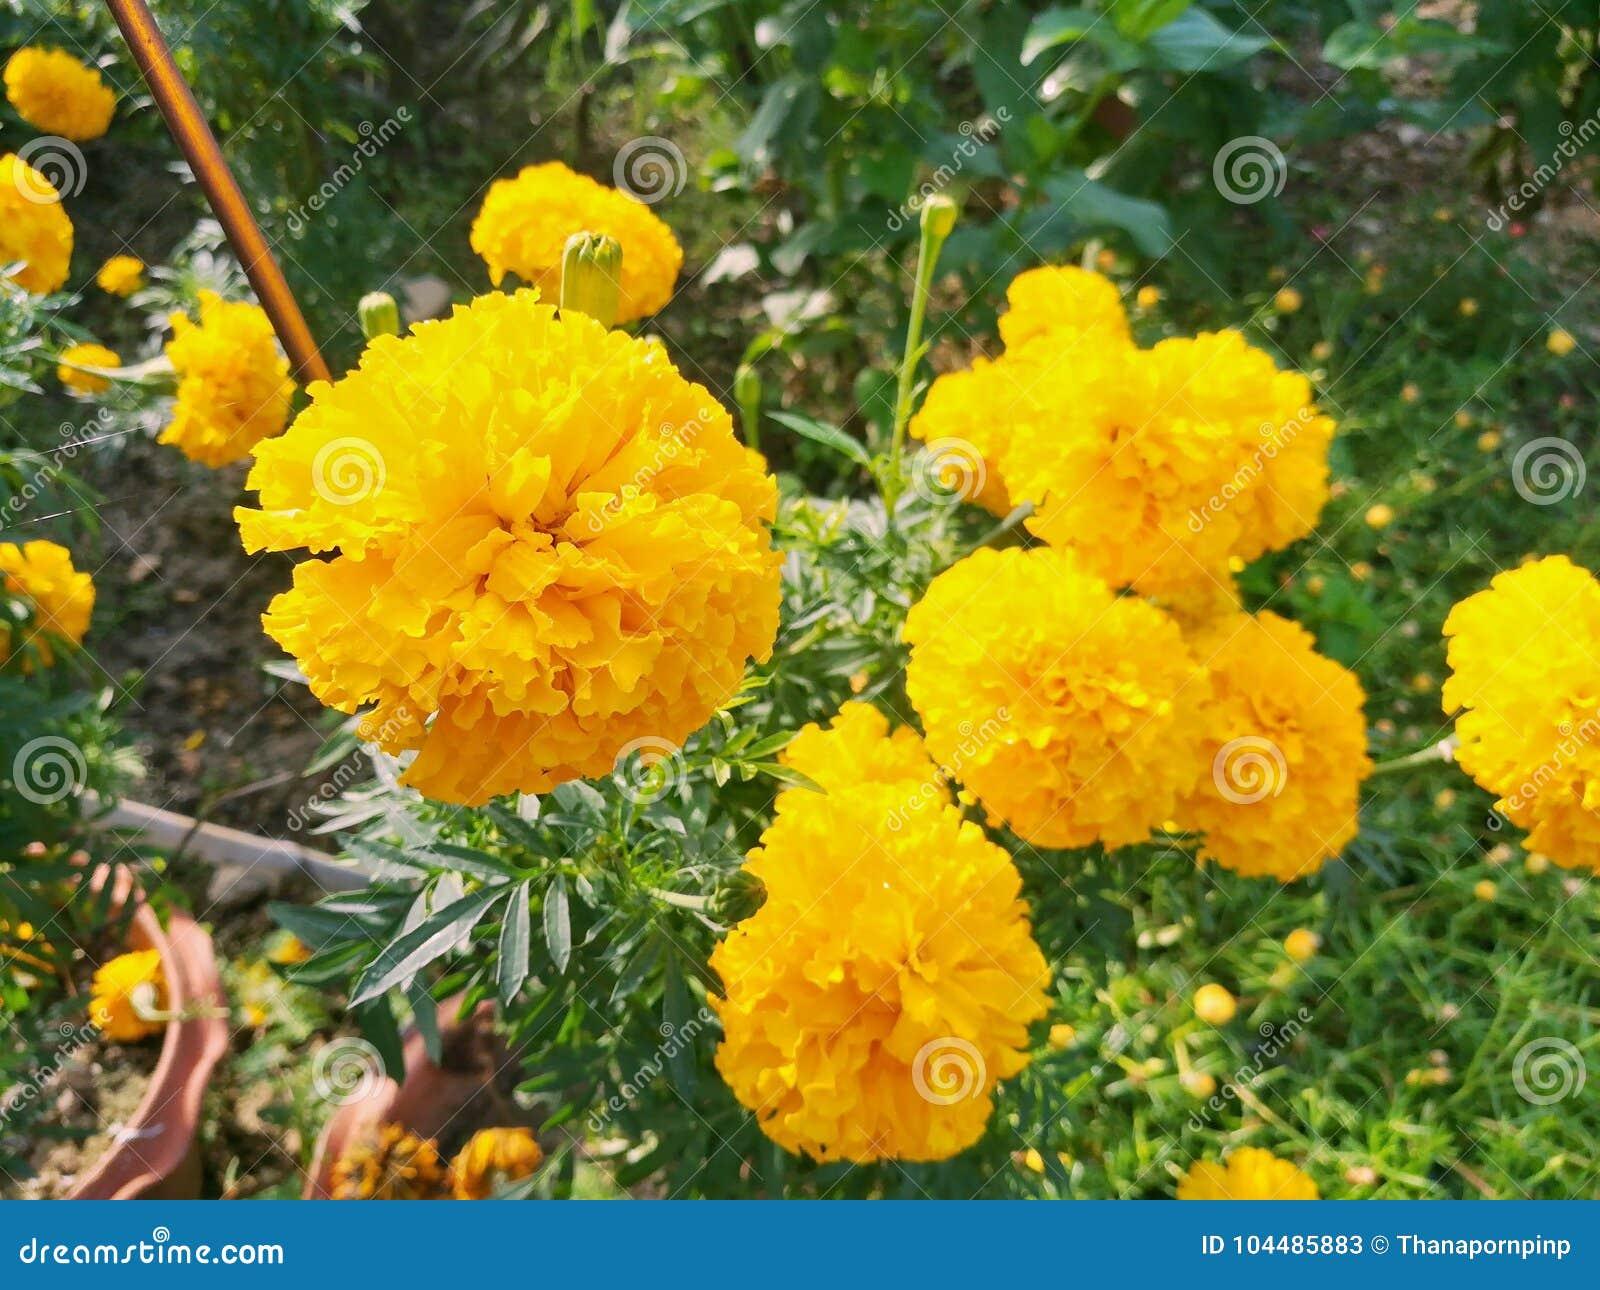 Cluster of marigold in the garden beautiful bright yellow flowers cluster of marigold in the garden beautiful bright yellow flowers mightylinksfo